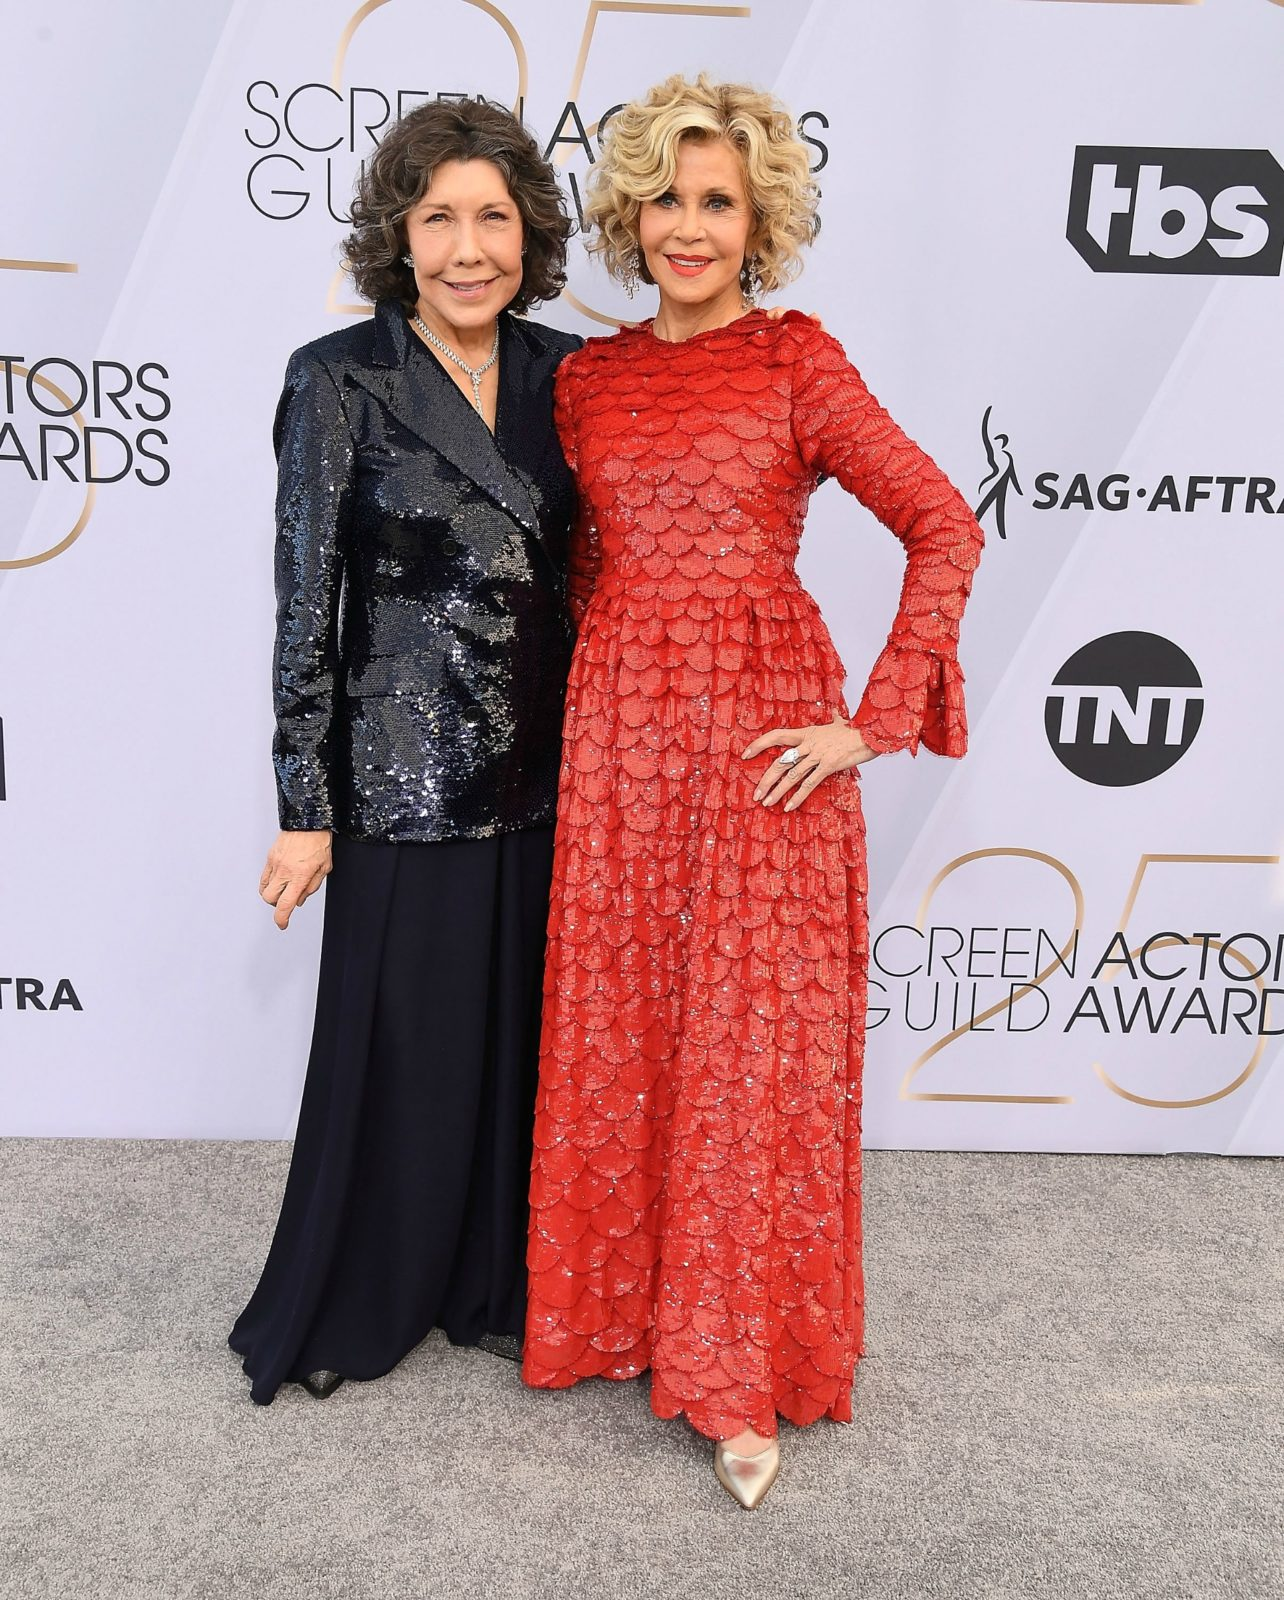 Jane Fonda kept her style elegant as she hit the red carpet alongside her co-star Lily Tomlin. Source: Getty